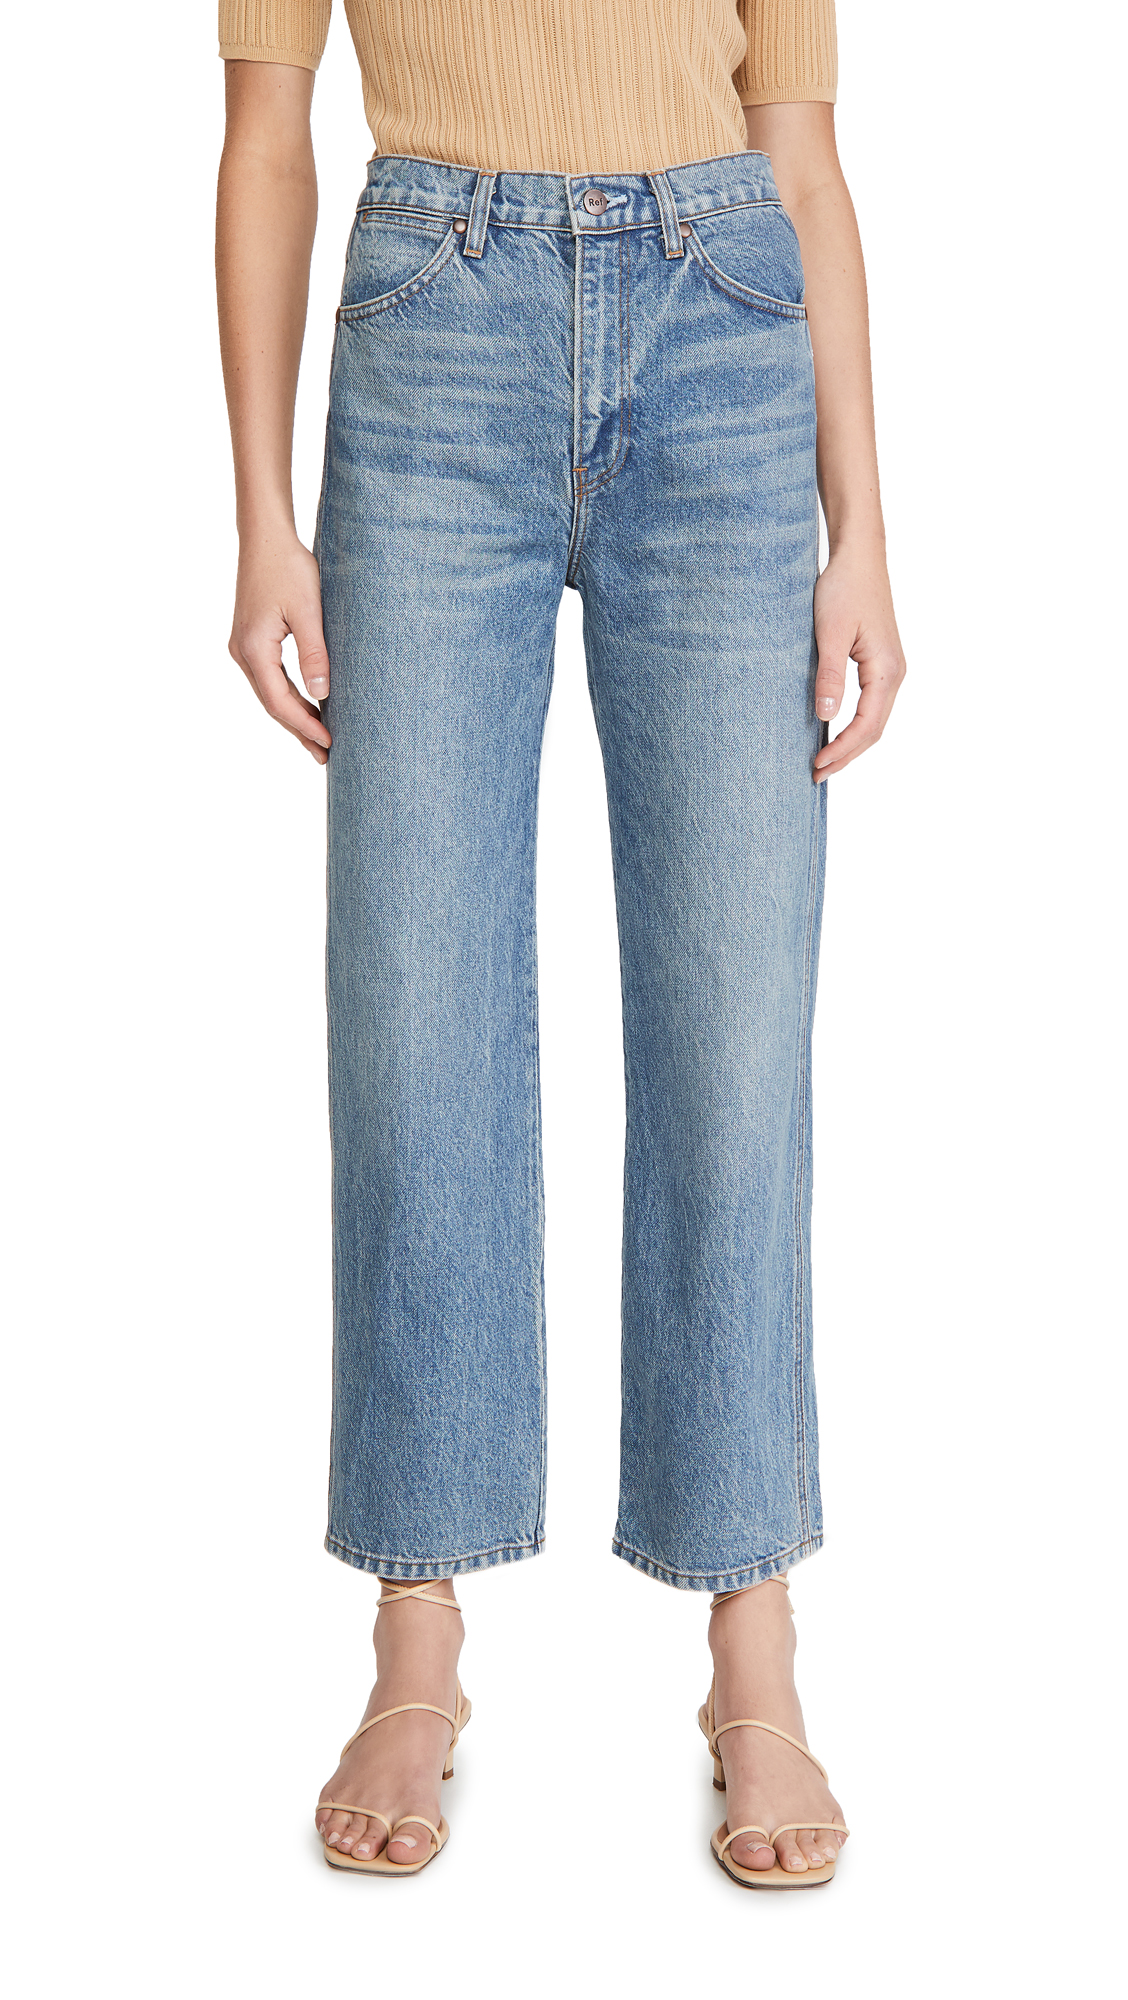 Reformation Cowboy Jeans